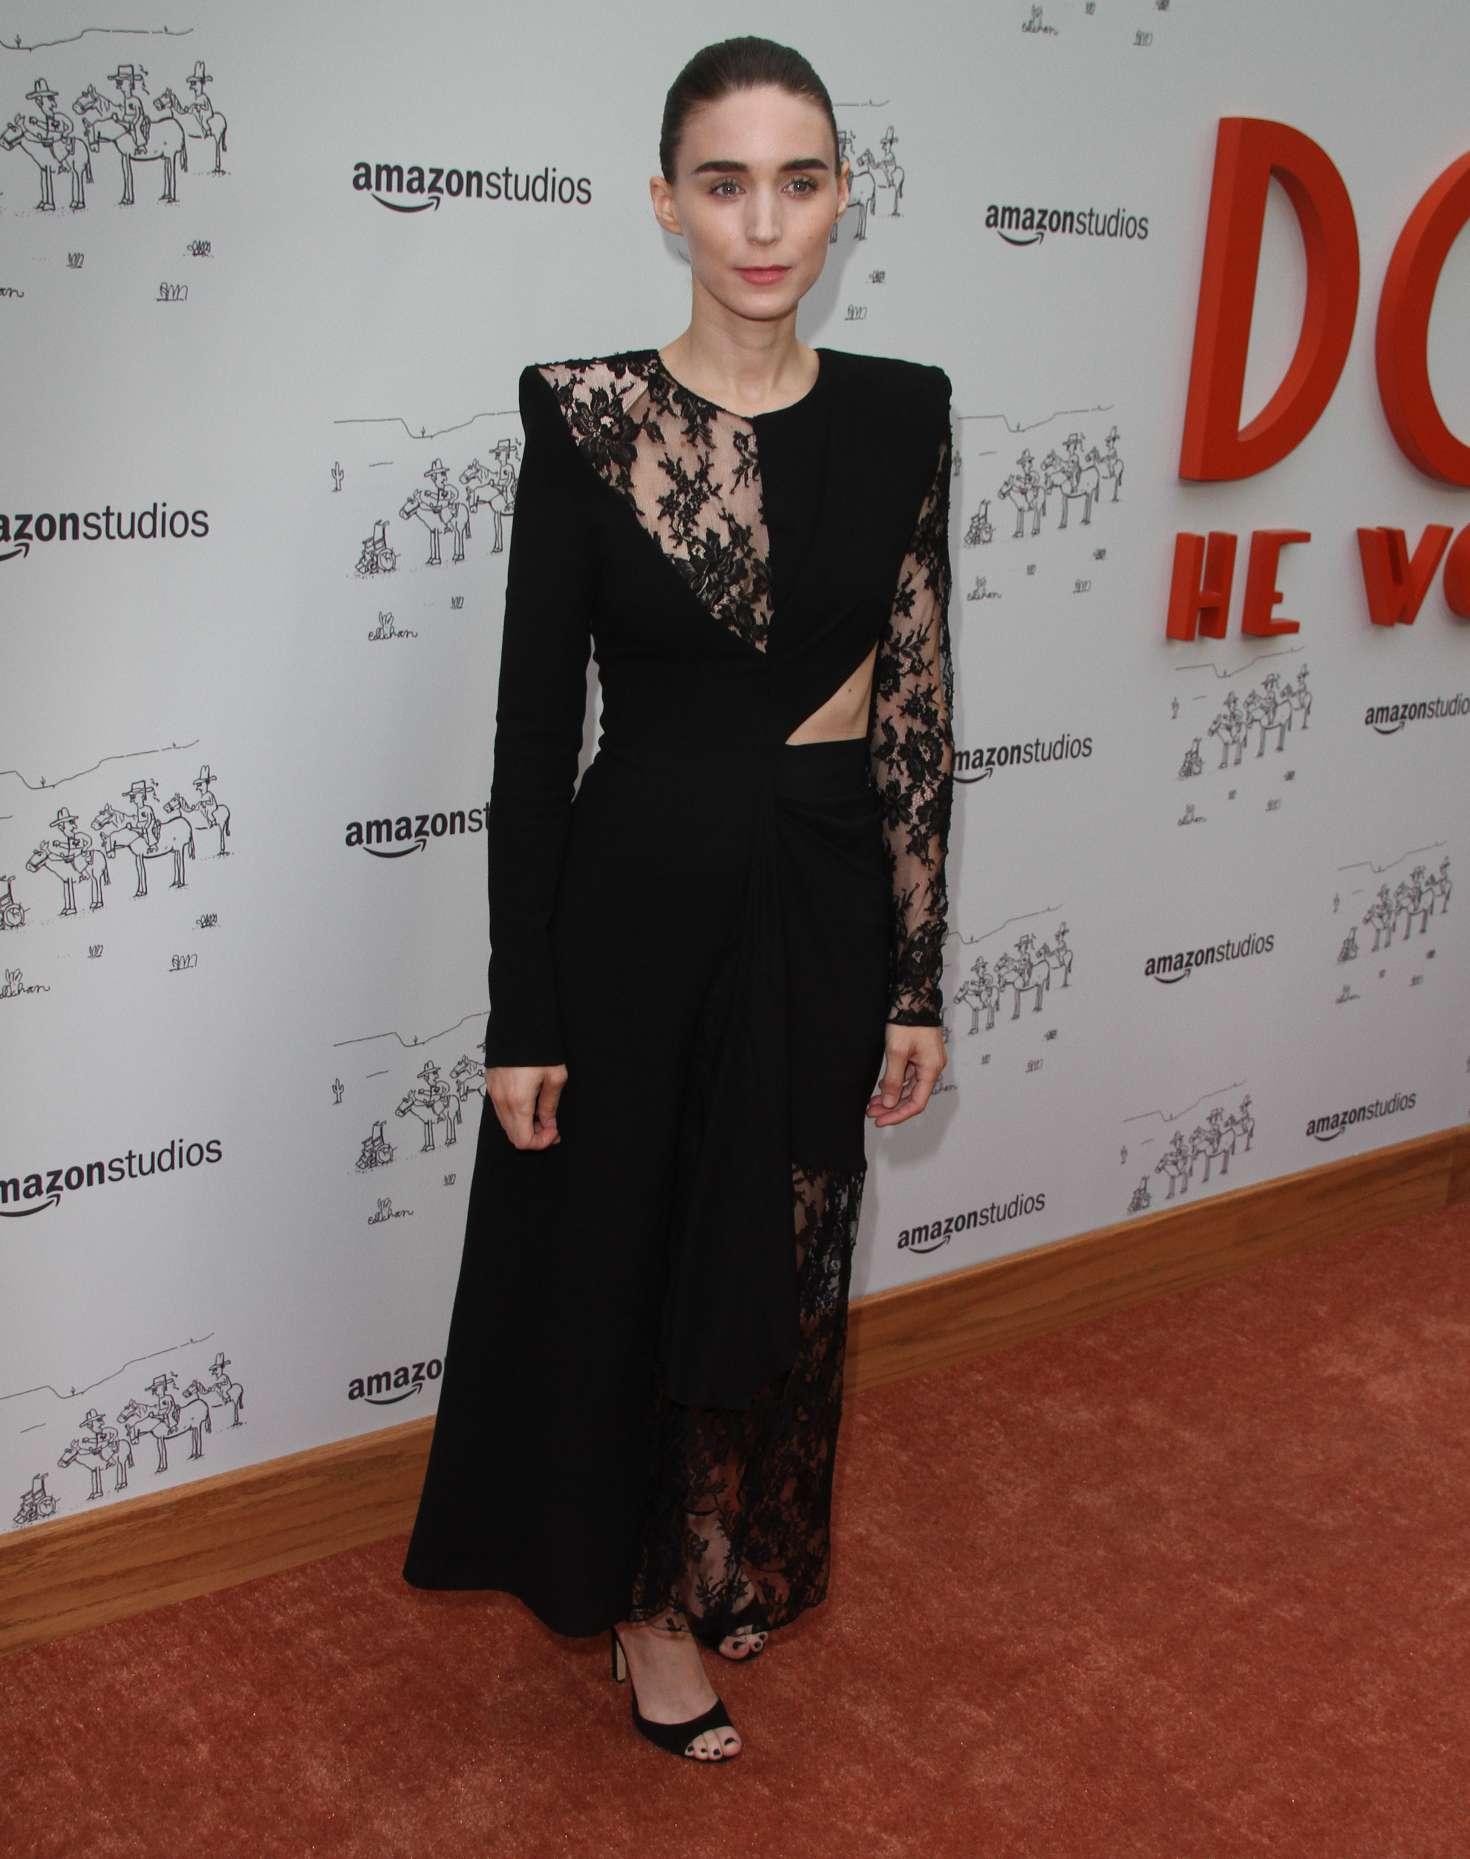 Rooney Mara 2018 : Rooney Mara: Dont Worry Premiere -11